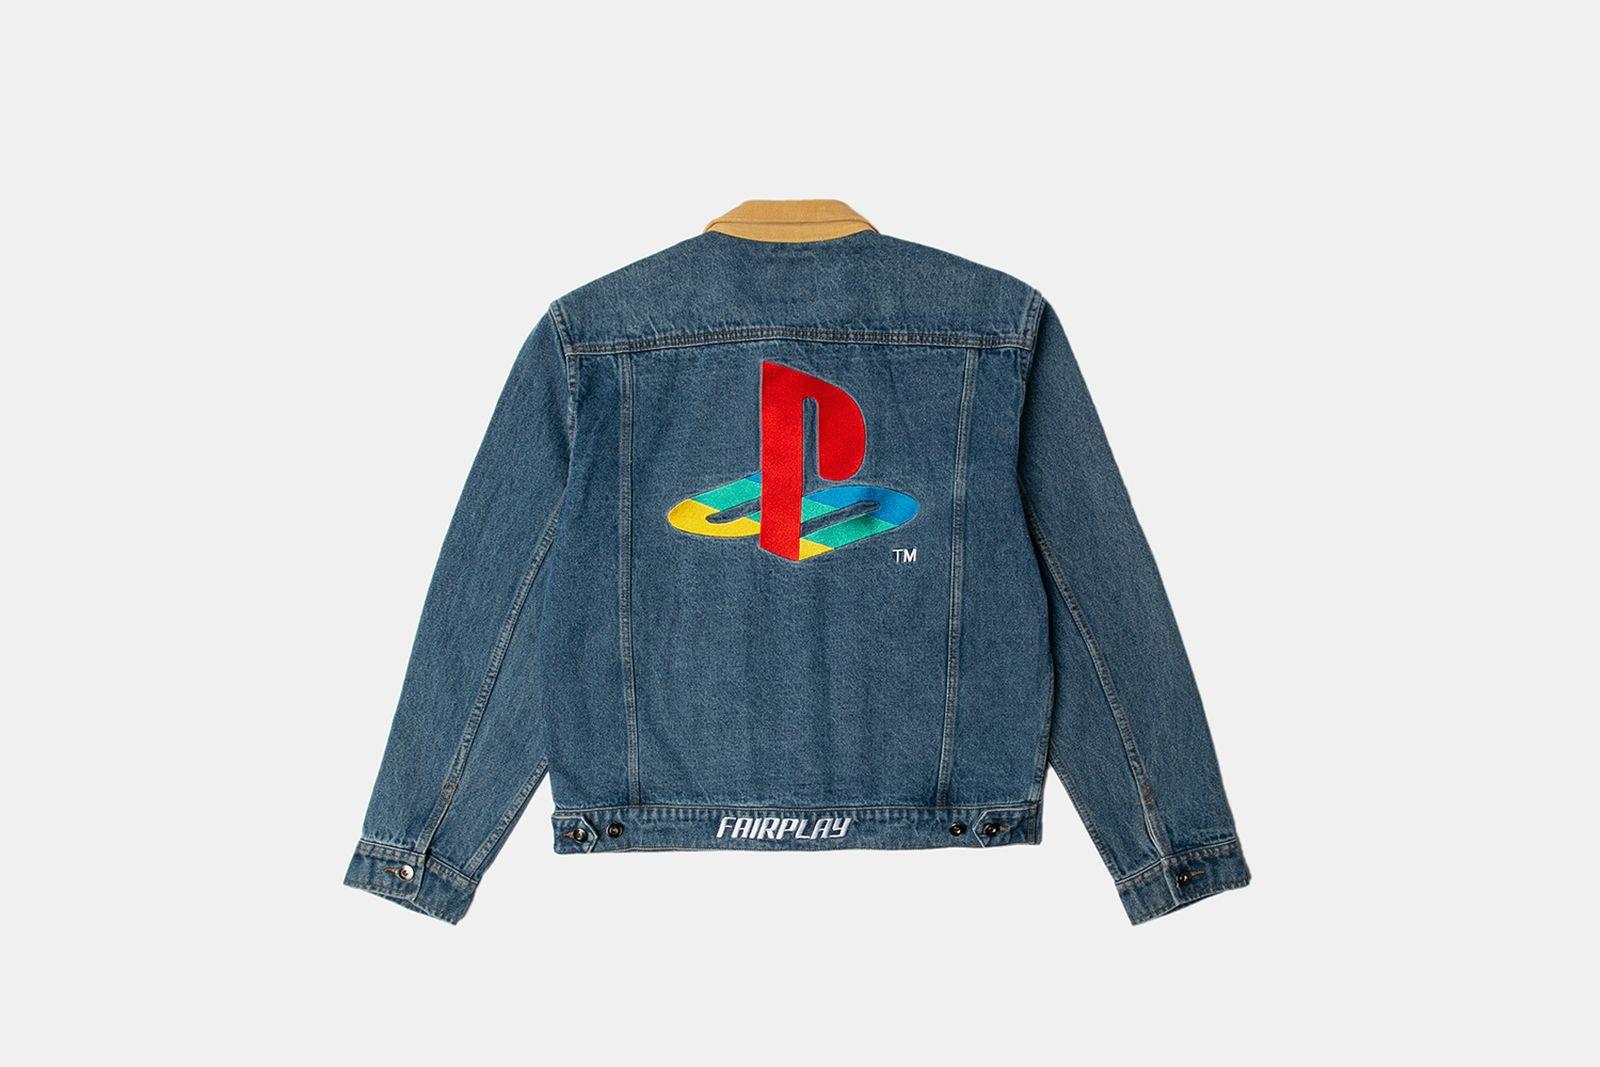 fairplay playstation 2 capsule Sony PlayStation